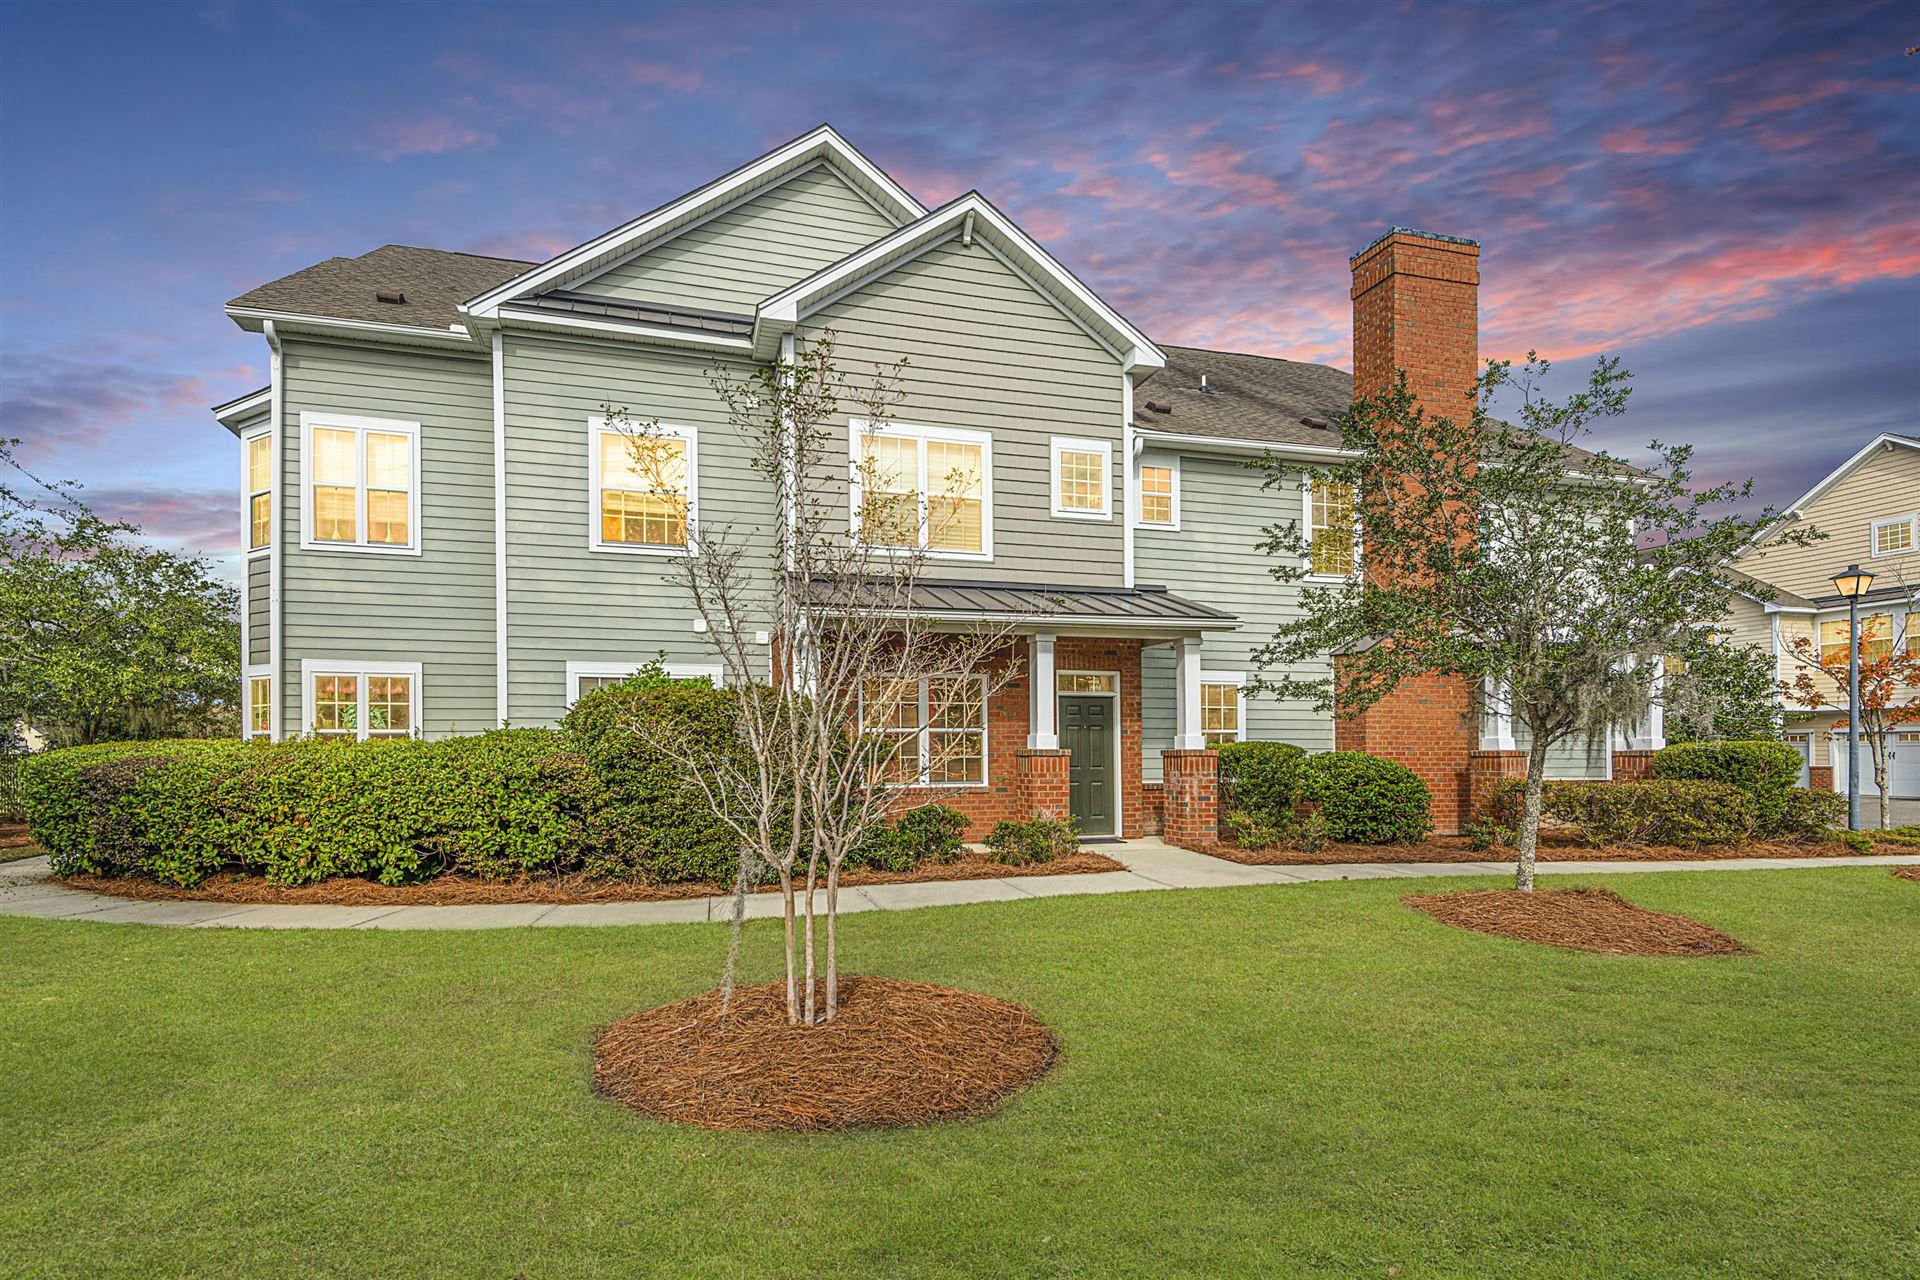 Photo of 100 Deerfield Drive #606, Charleston, SC 29414 (MLS # 21016618)